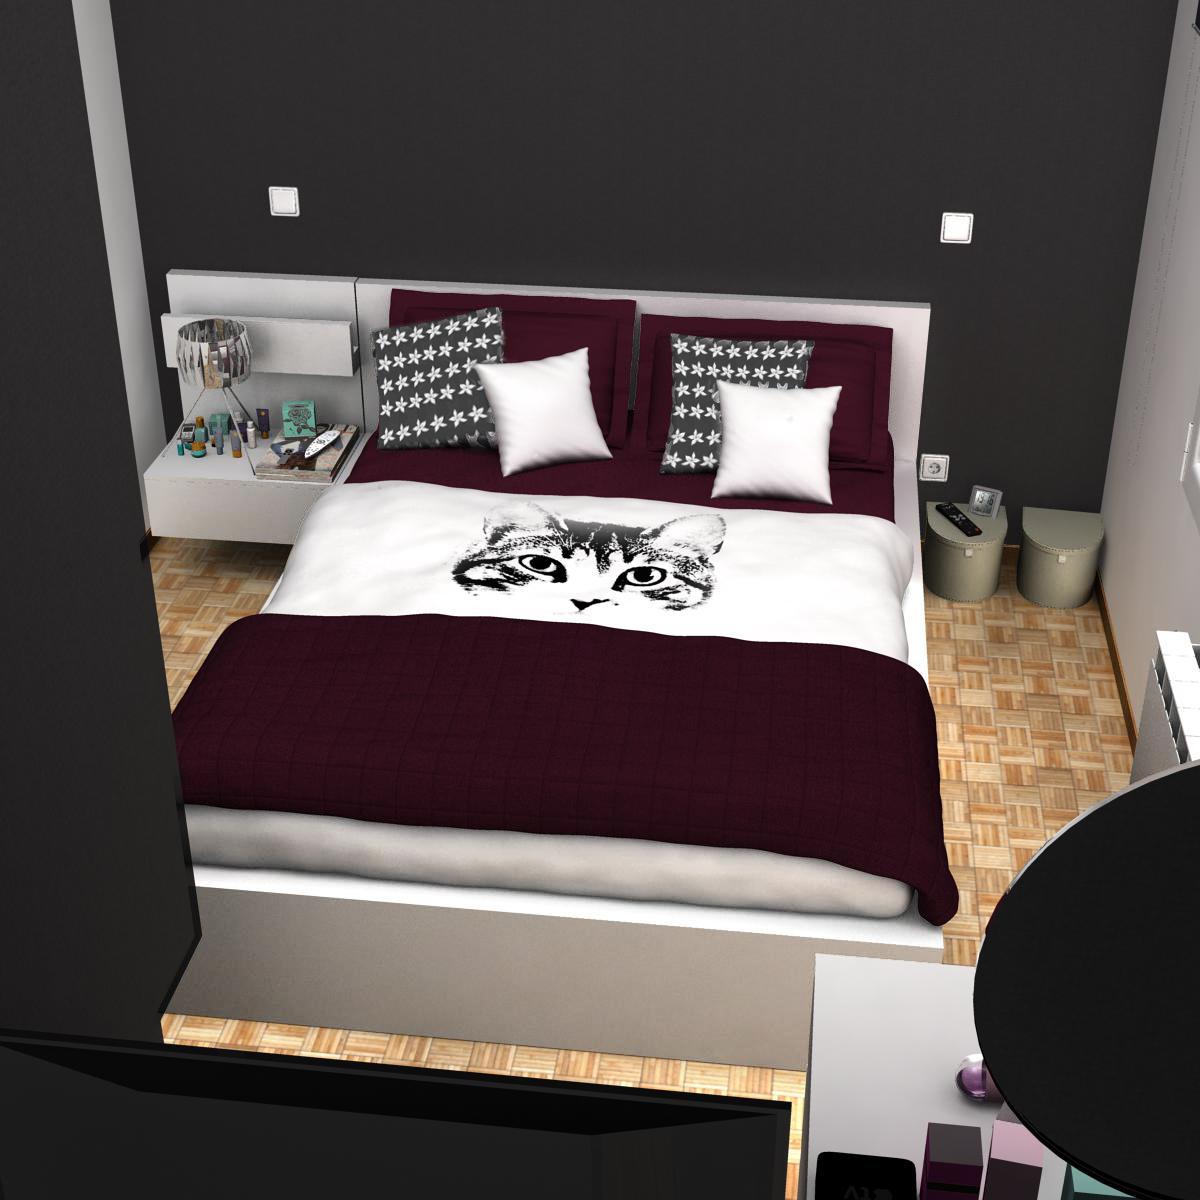 guļamistaba 8 3d modelis 3ds max fbx c4d ma mb obj 159562